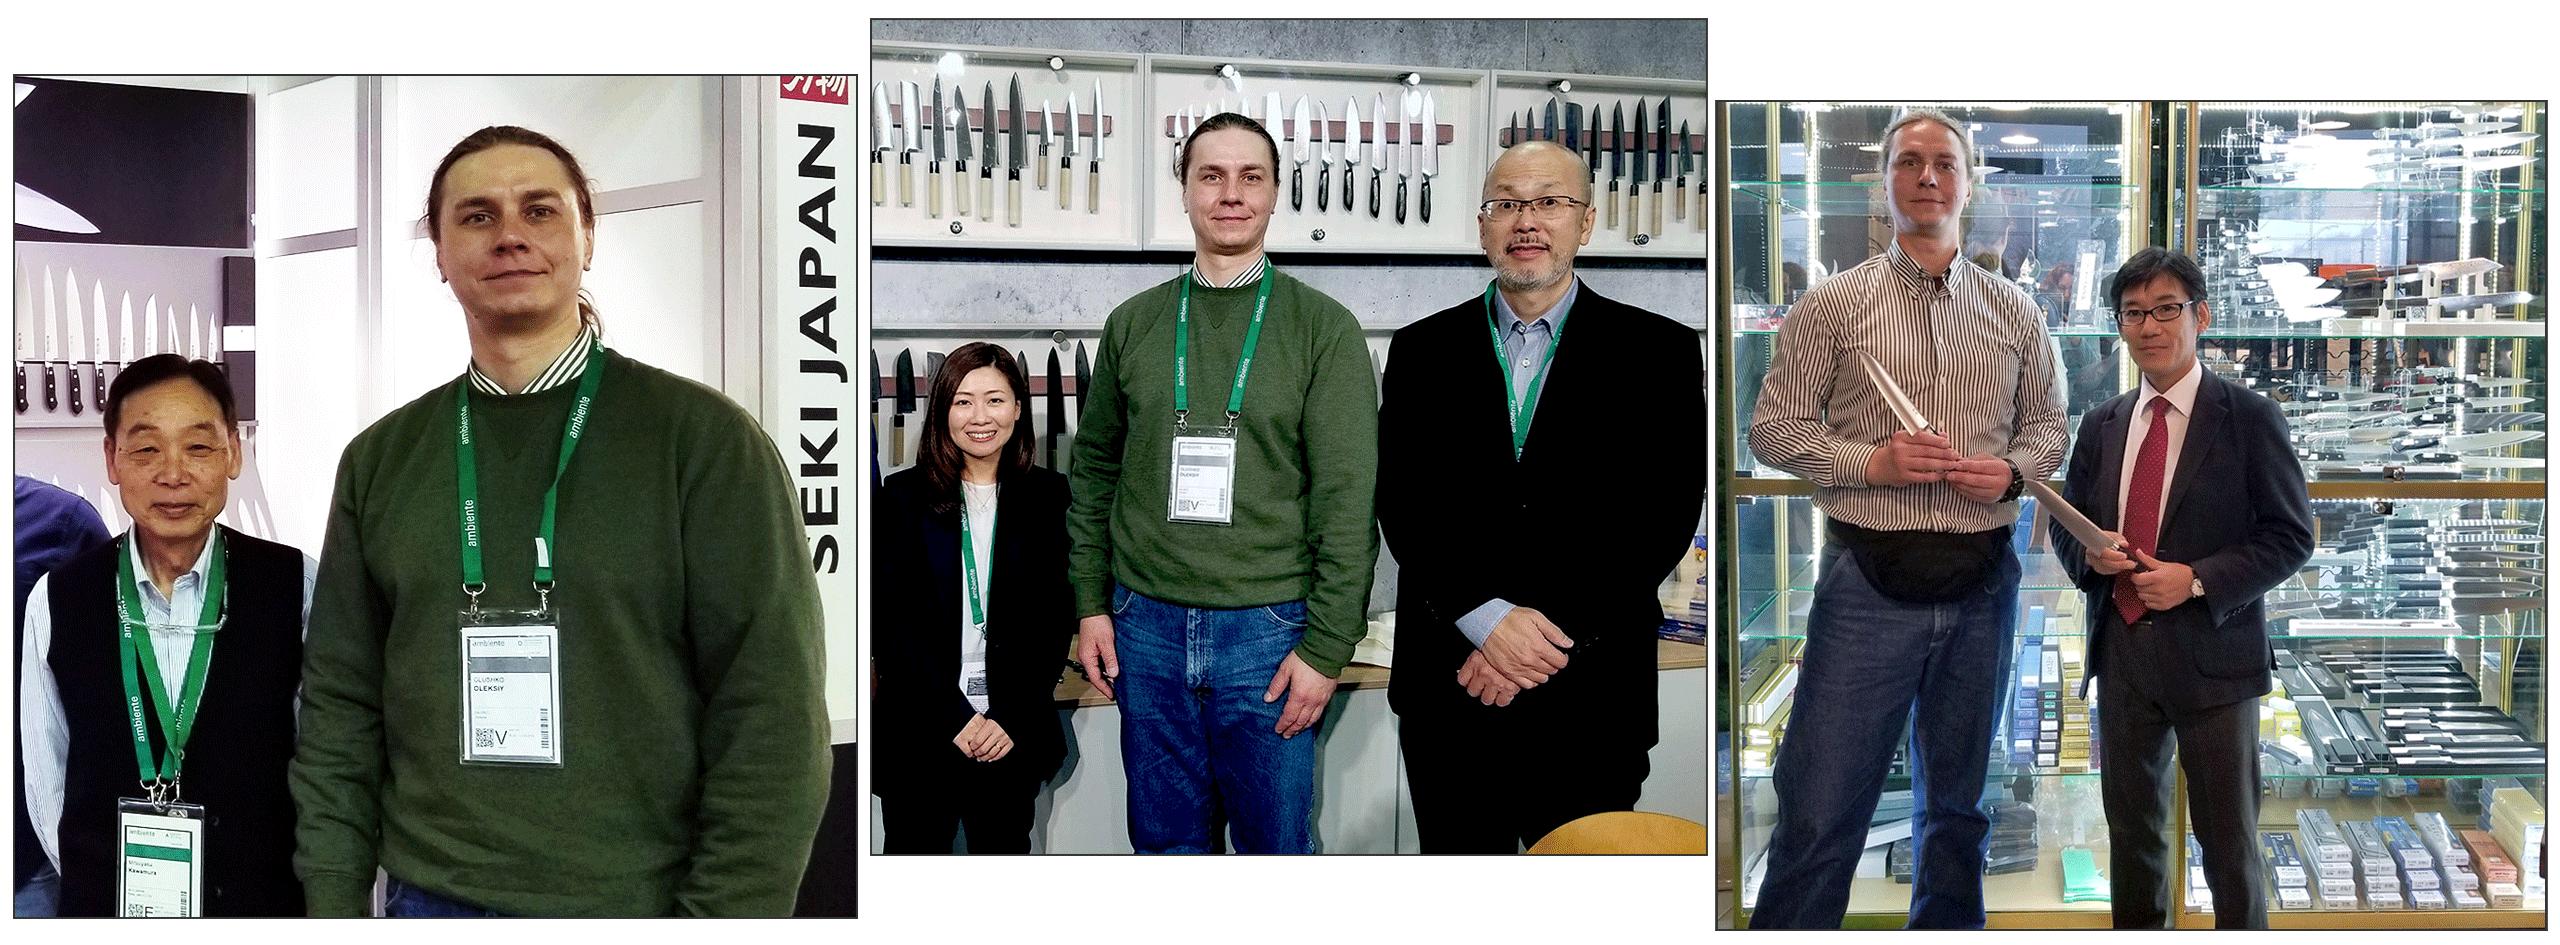 Photos with our partners - The representatives of companies: Seki Kanetsugu, Tojiro, Hokiyama Cutlery